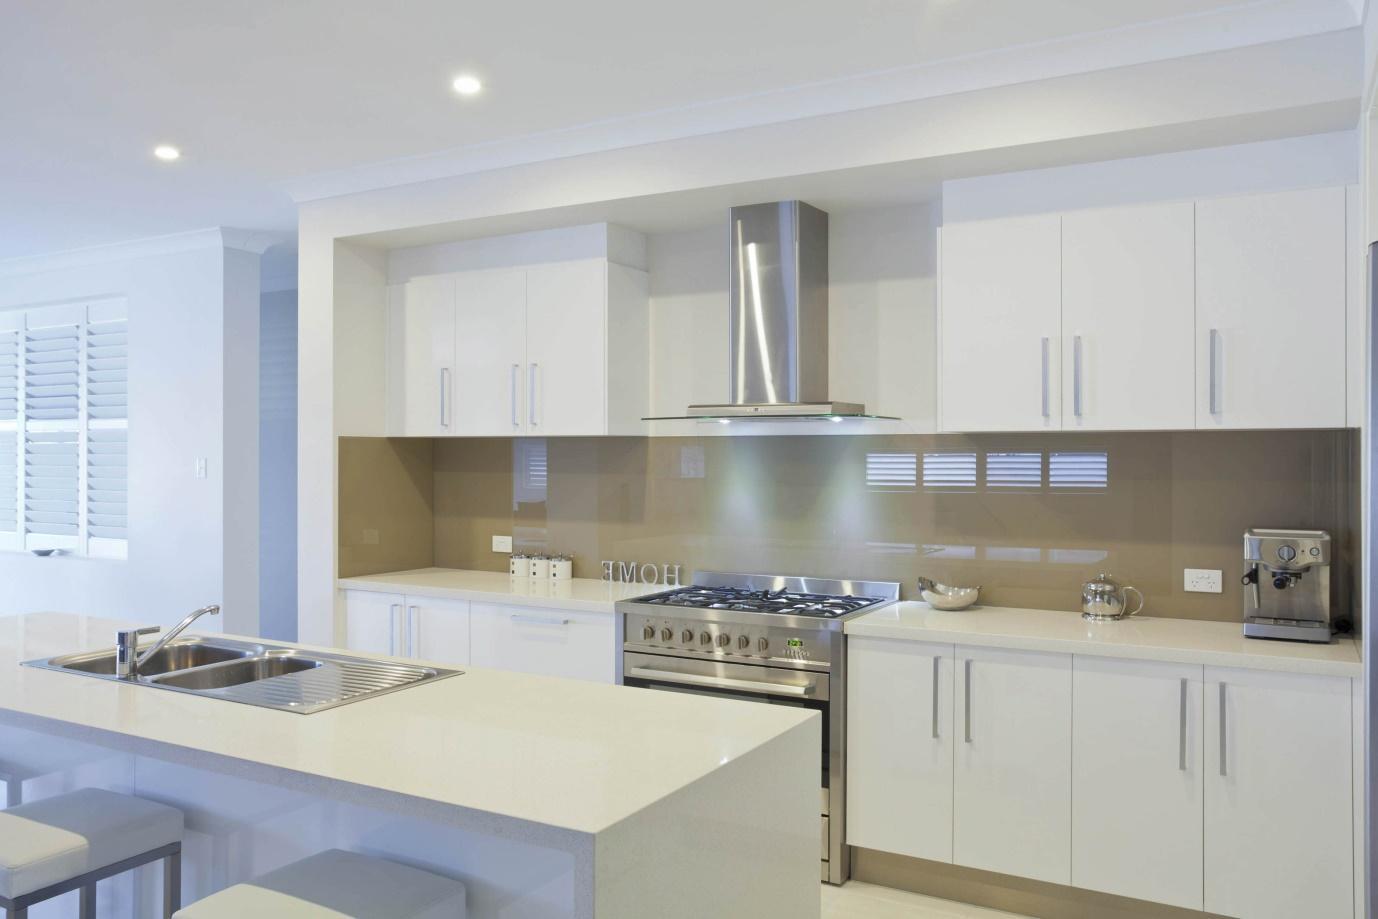 Guide to designing a modular kitchen